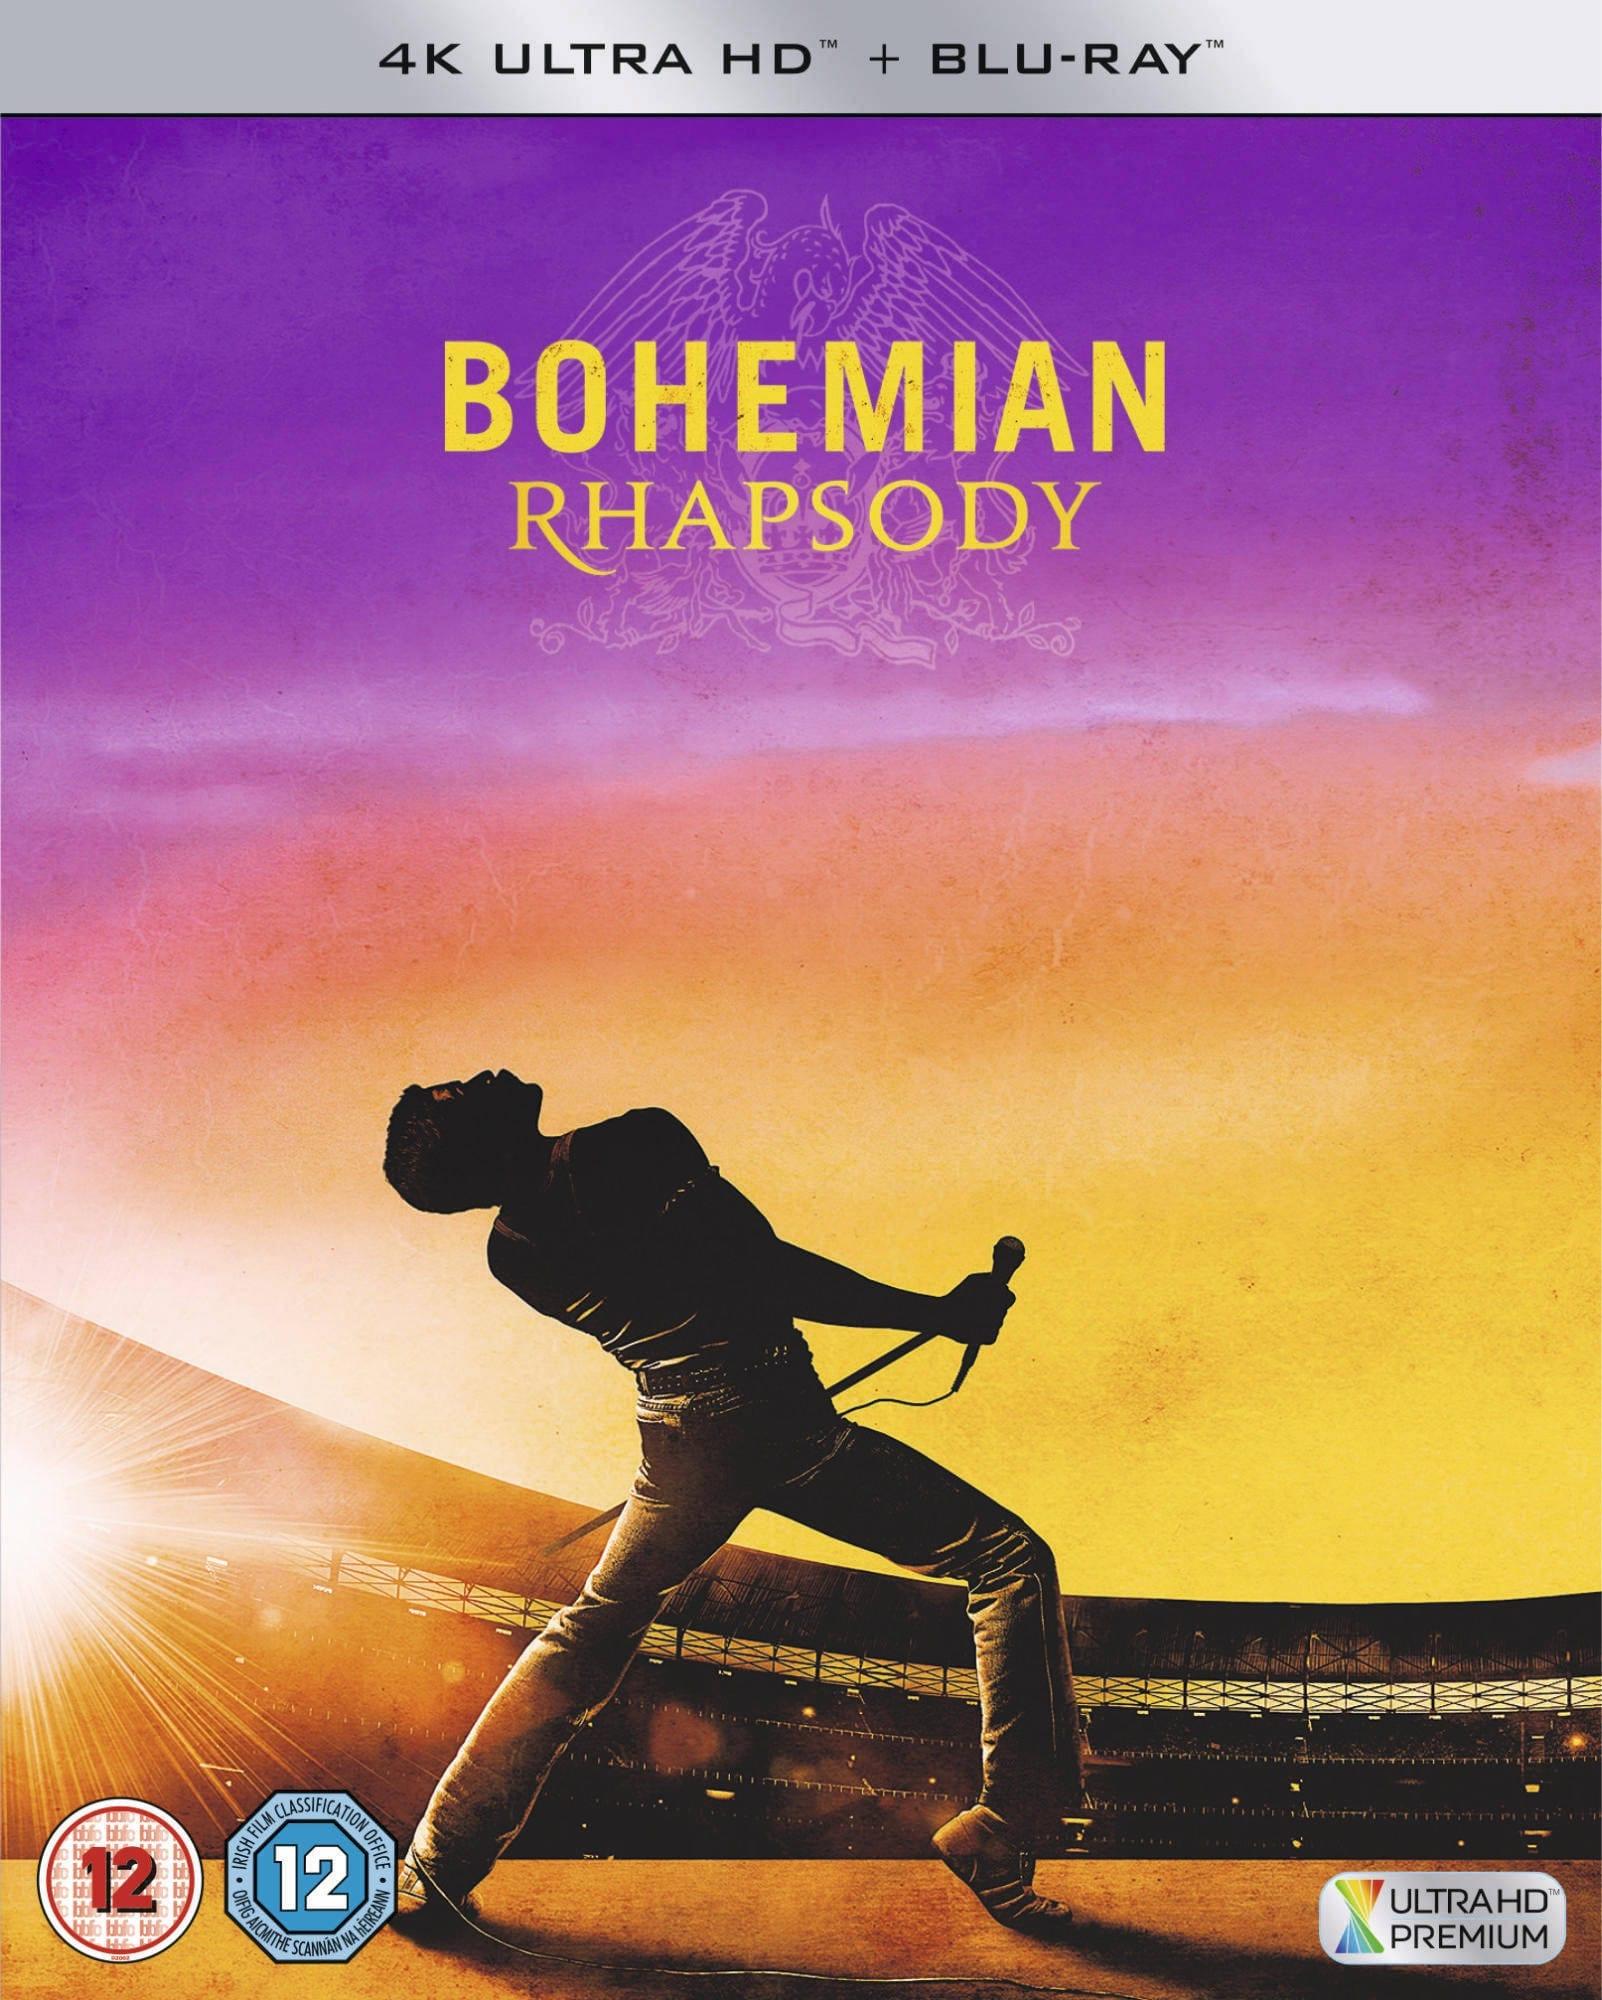 Win Bohemian Rhapsody on 4K Ultra HD Blu-ray - Movies Games and Tech